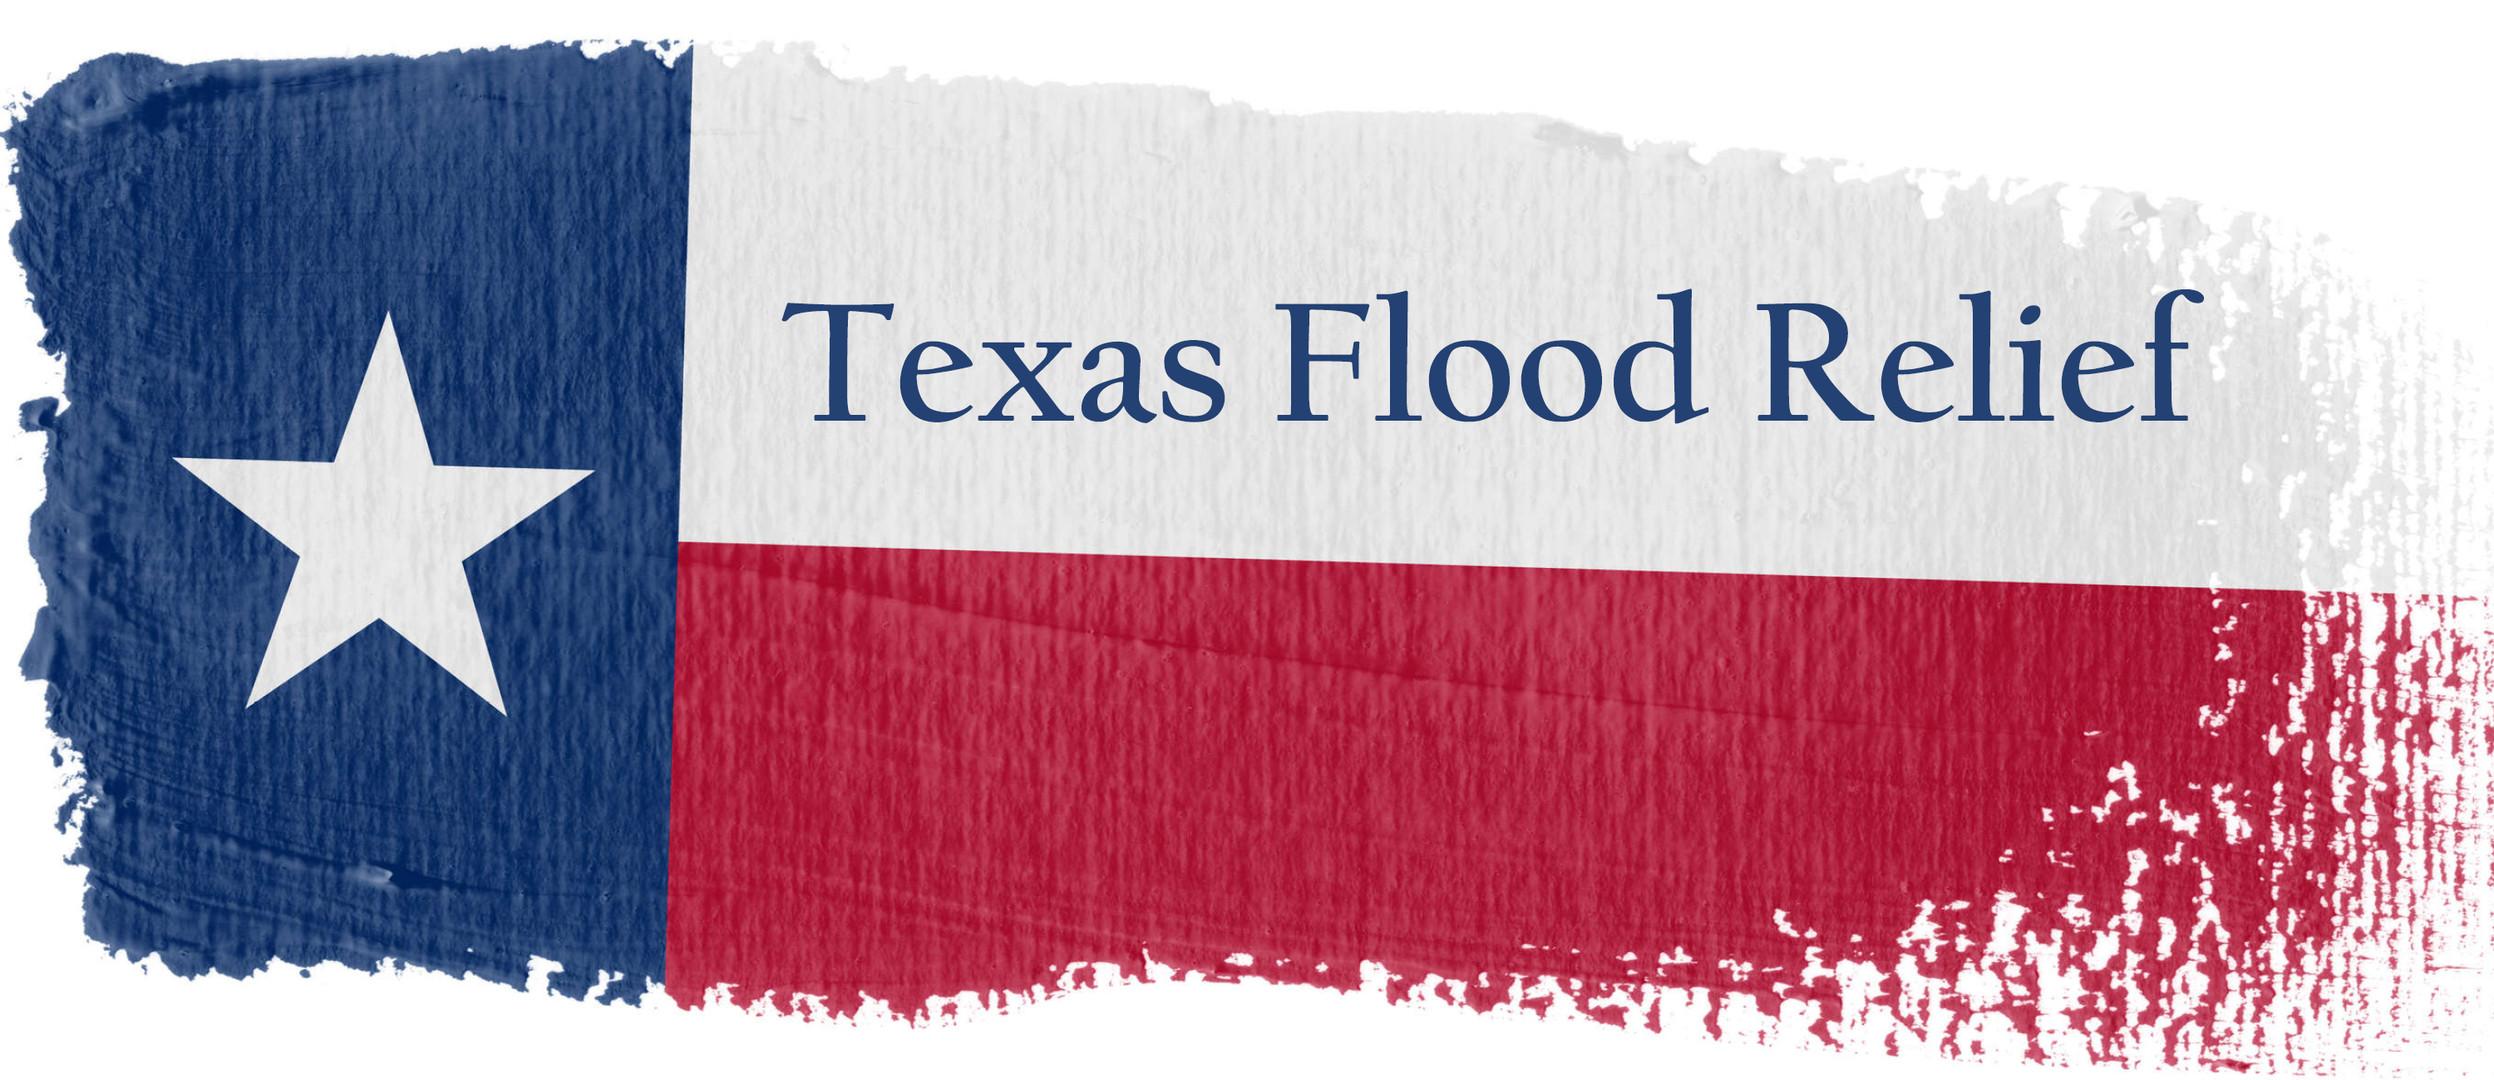 Texas Flood Relief Banner_3.jpg